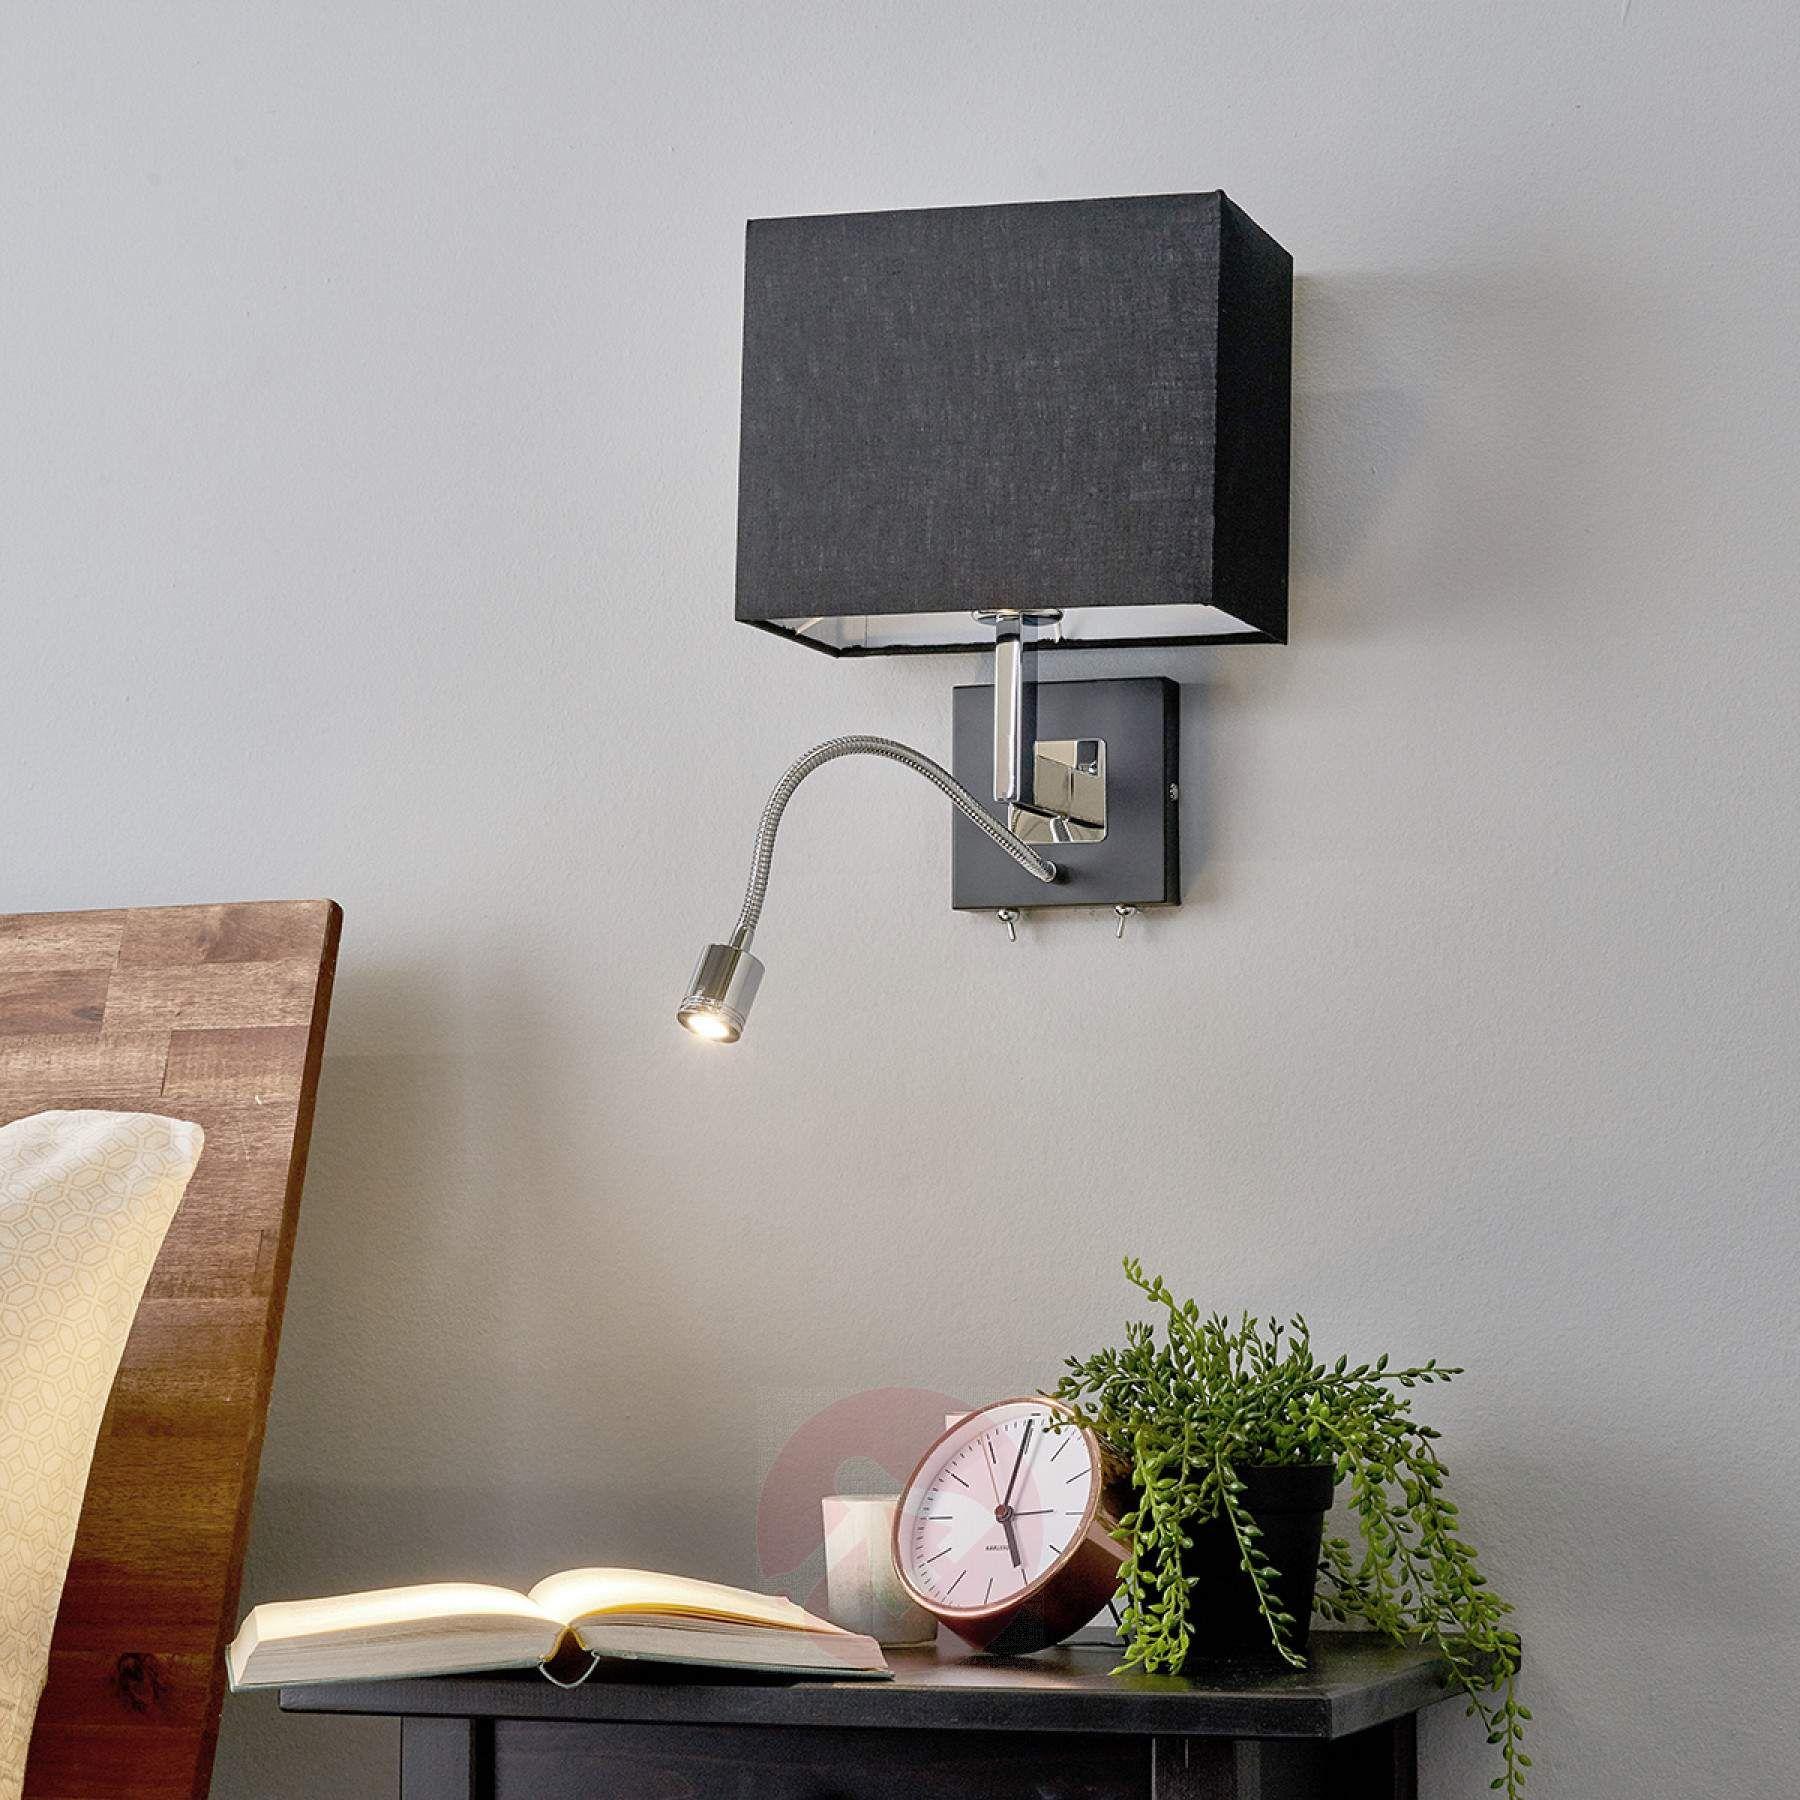 Black Fabric Wall Lamp Rebekka Led Reading Arm Attic Bedroom Decor Bedroom Reading Lights Wall Lights